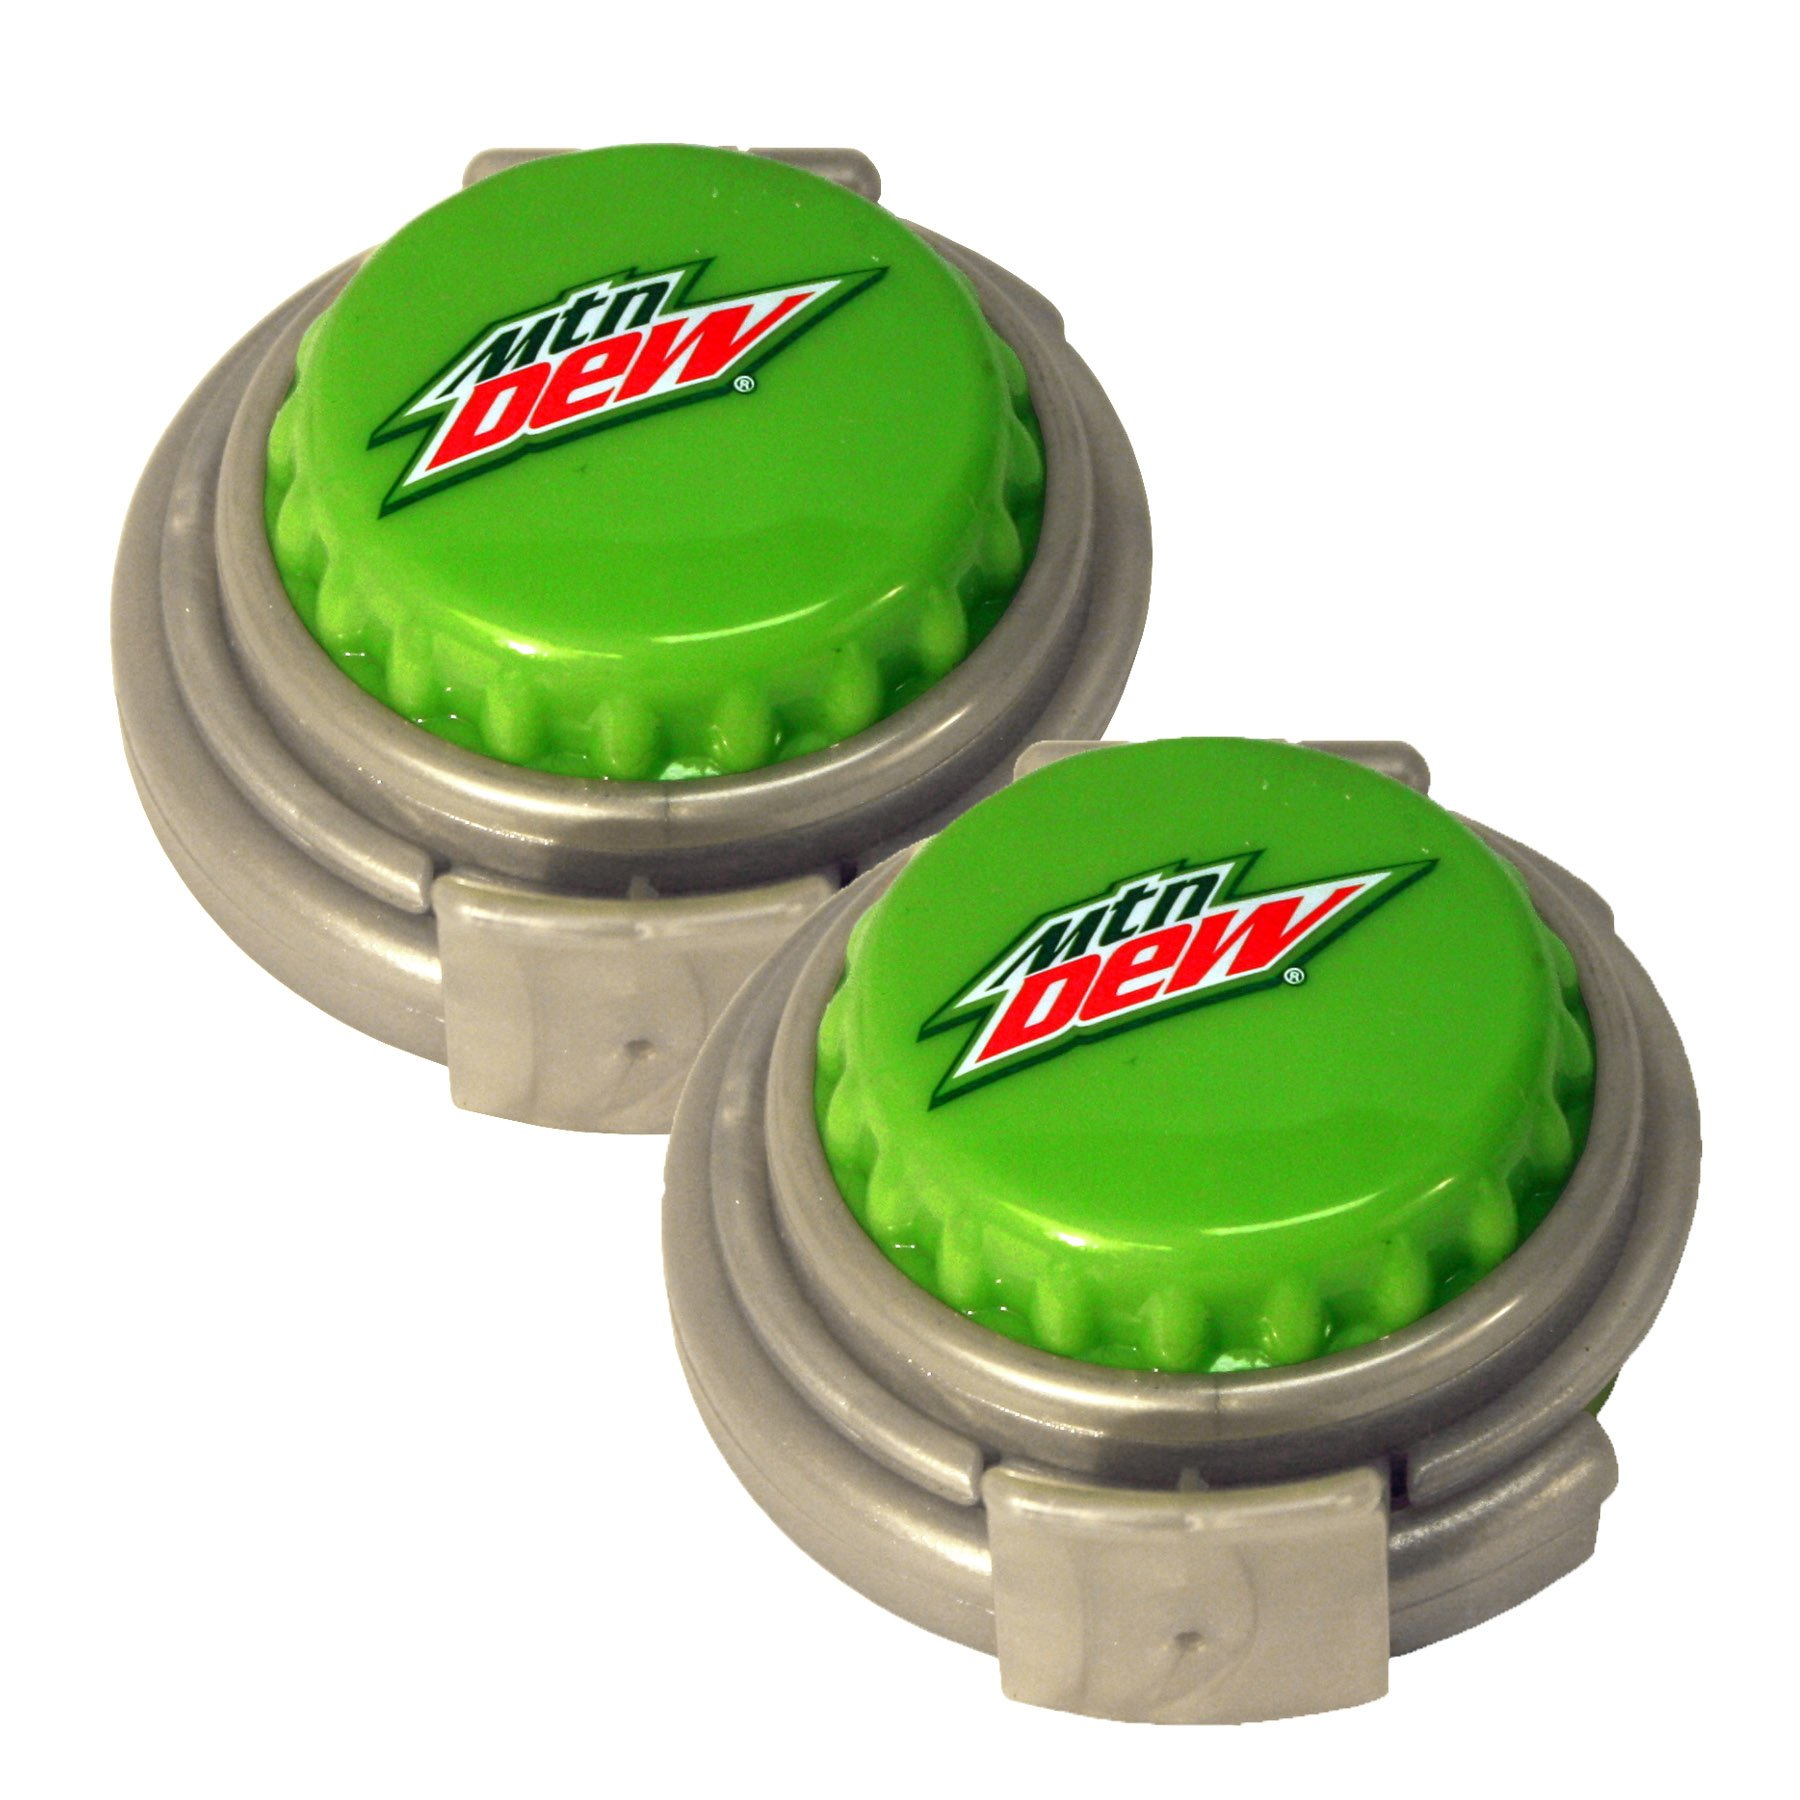 Jokari 2 Count Mtn Dew Modern Logo Soda Can Pump and Pour Caps, Green by Jokari